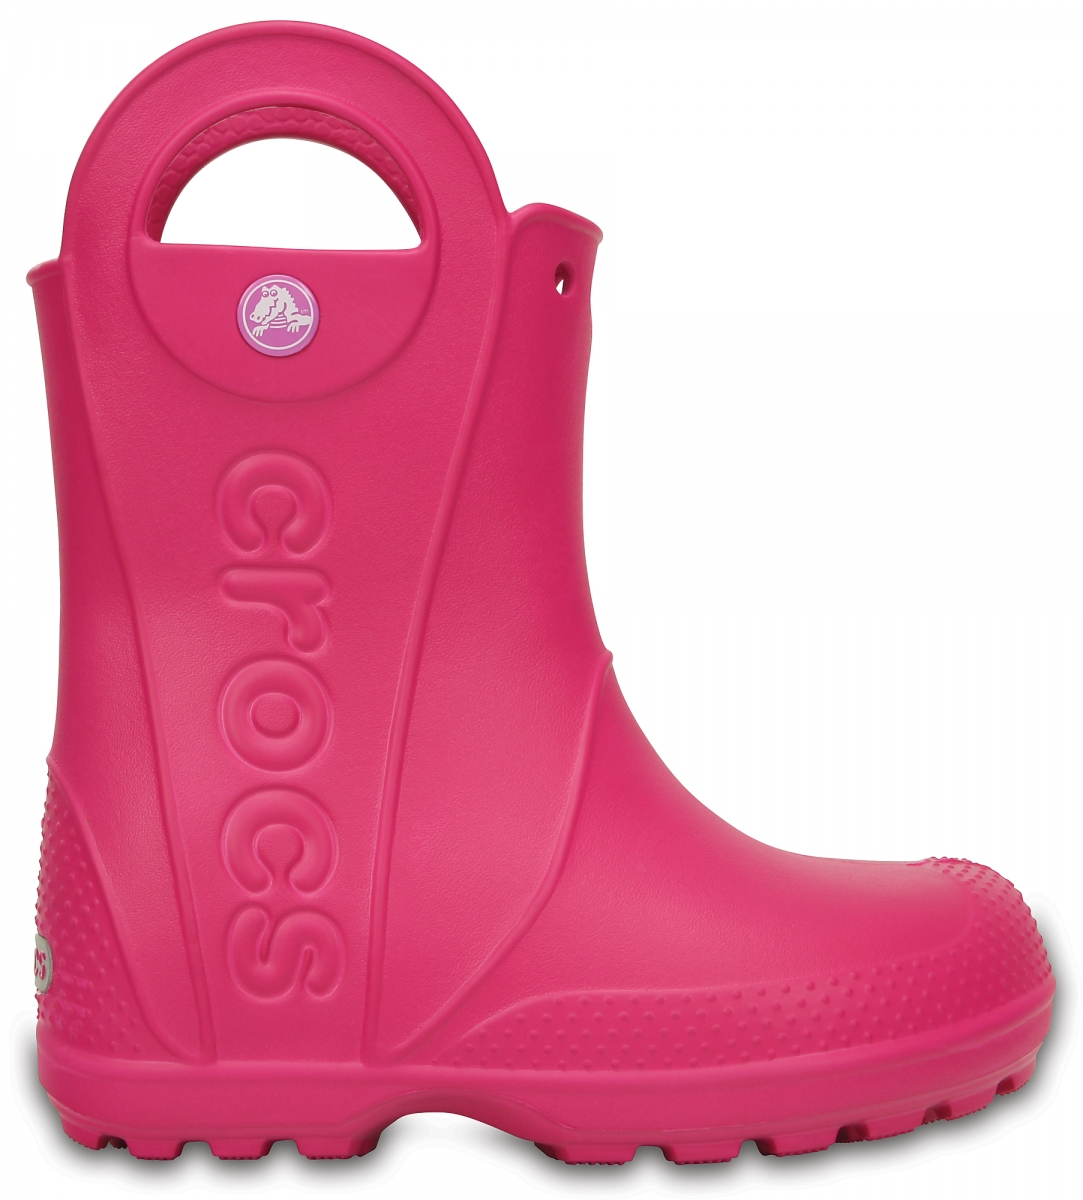 Crocs Handle It Rain Boot Kids - Candy Pink, C8 (24-25)